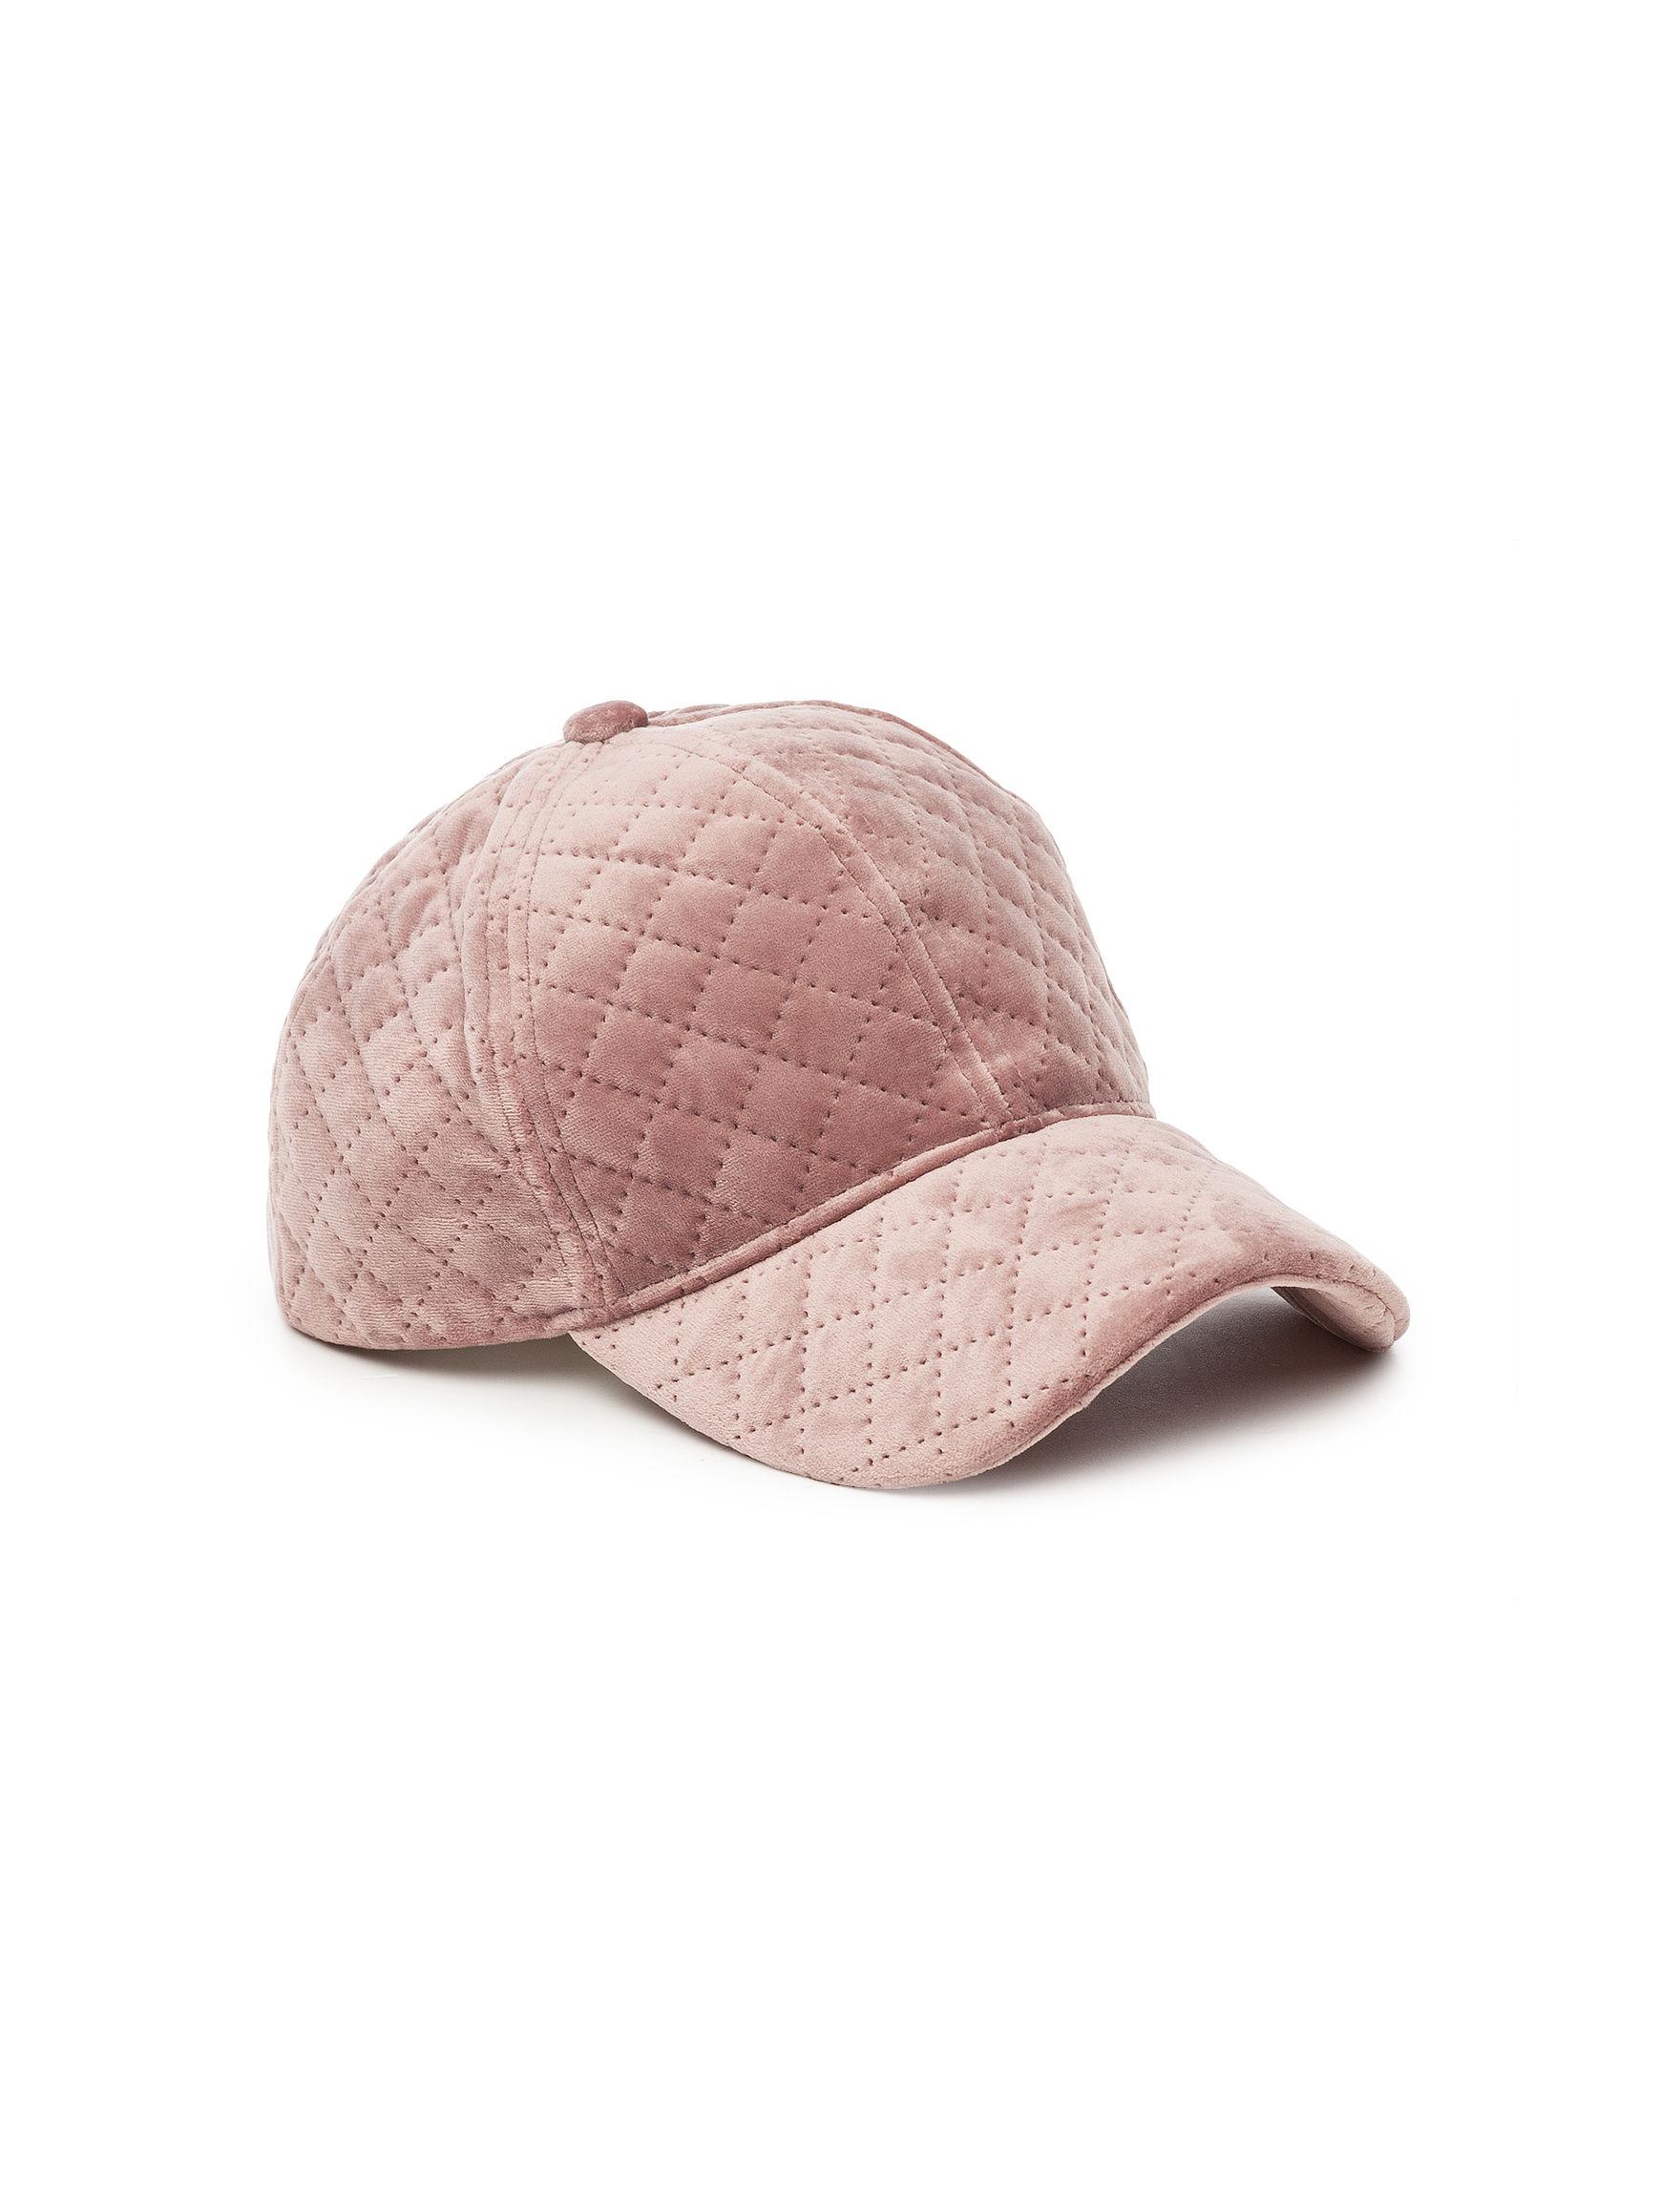 David & Young Mauve Hats & Headwear